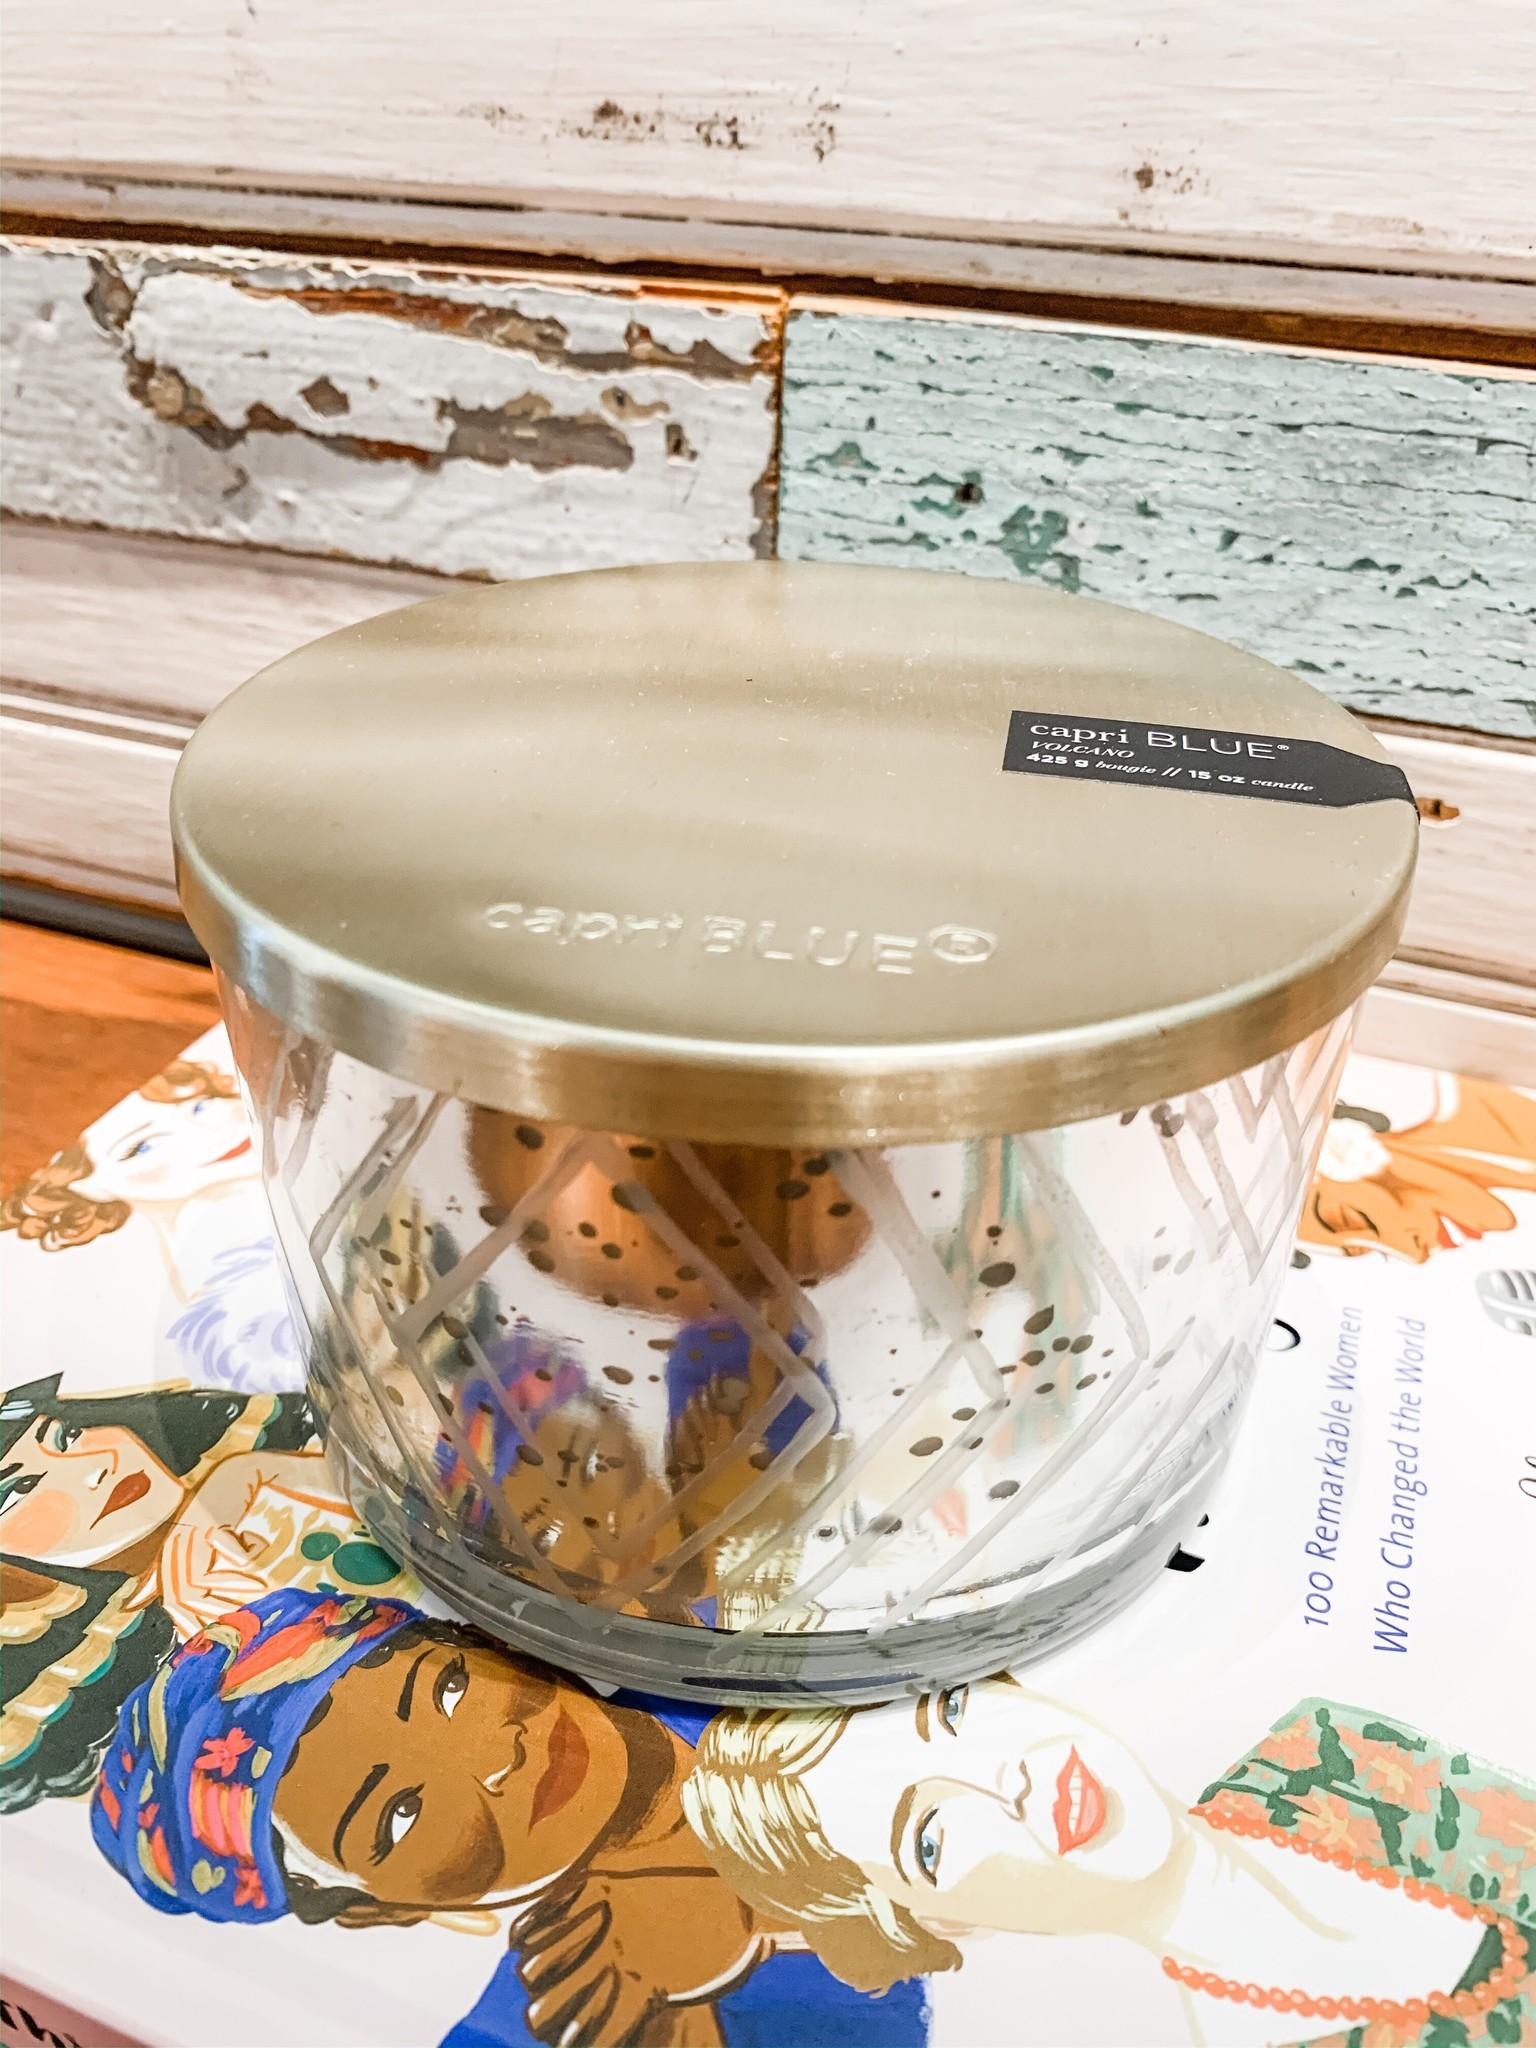 Capri Blue Volcano Mercury Candle Bowl